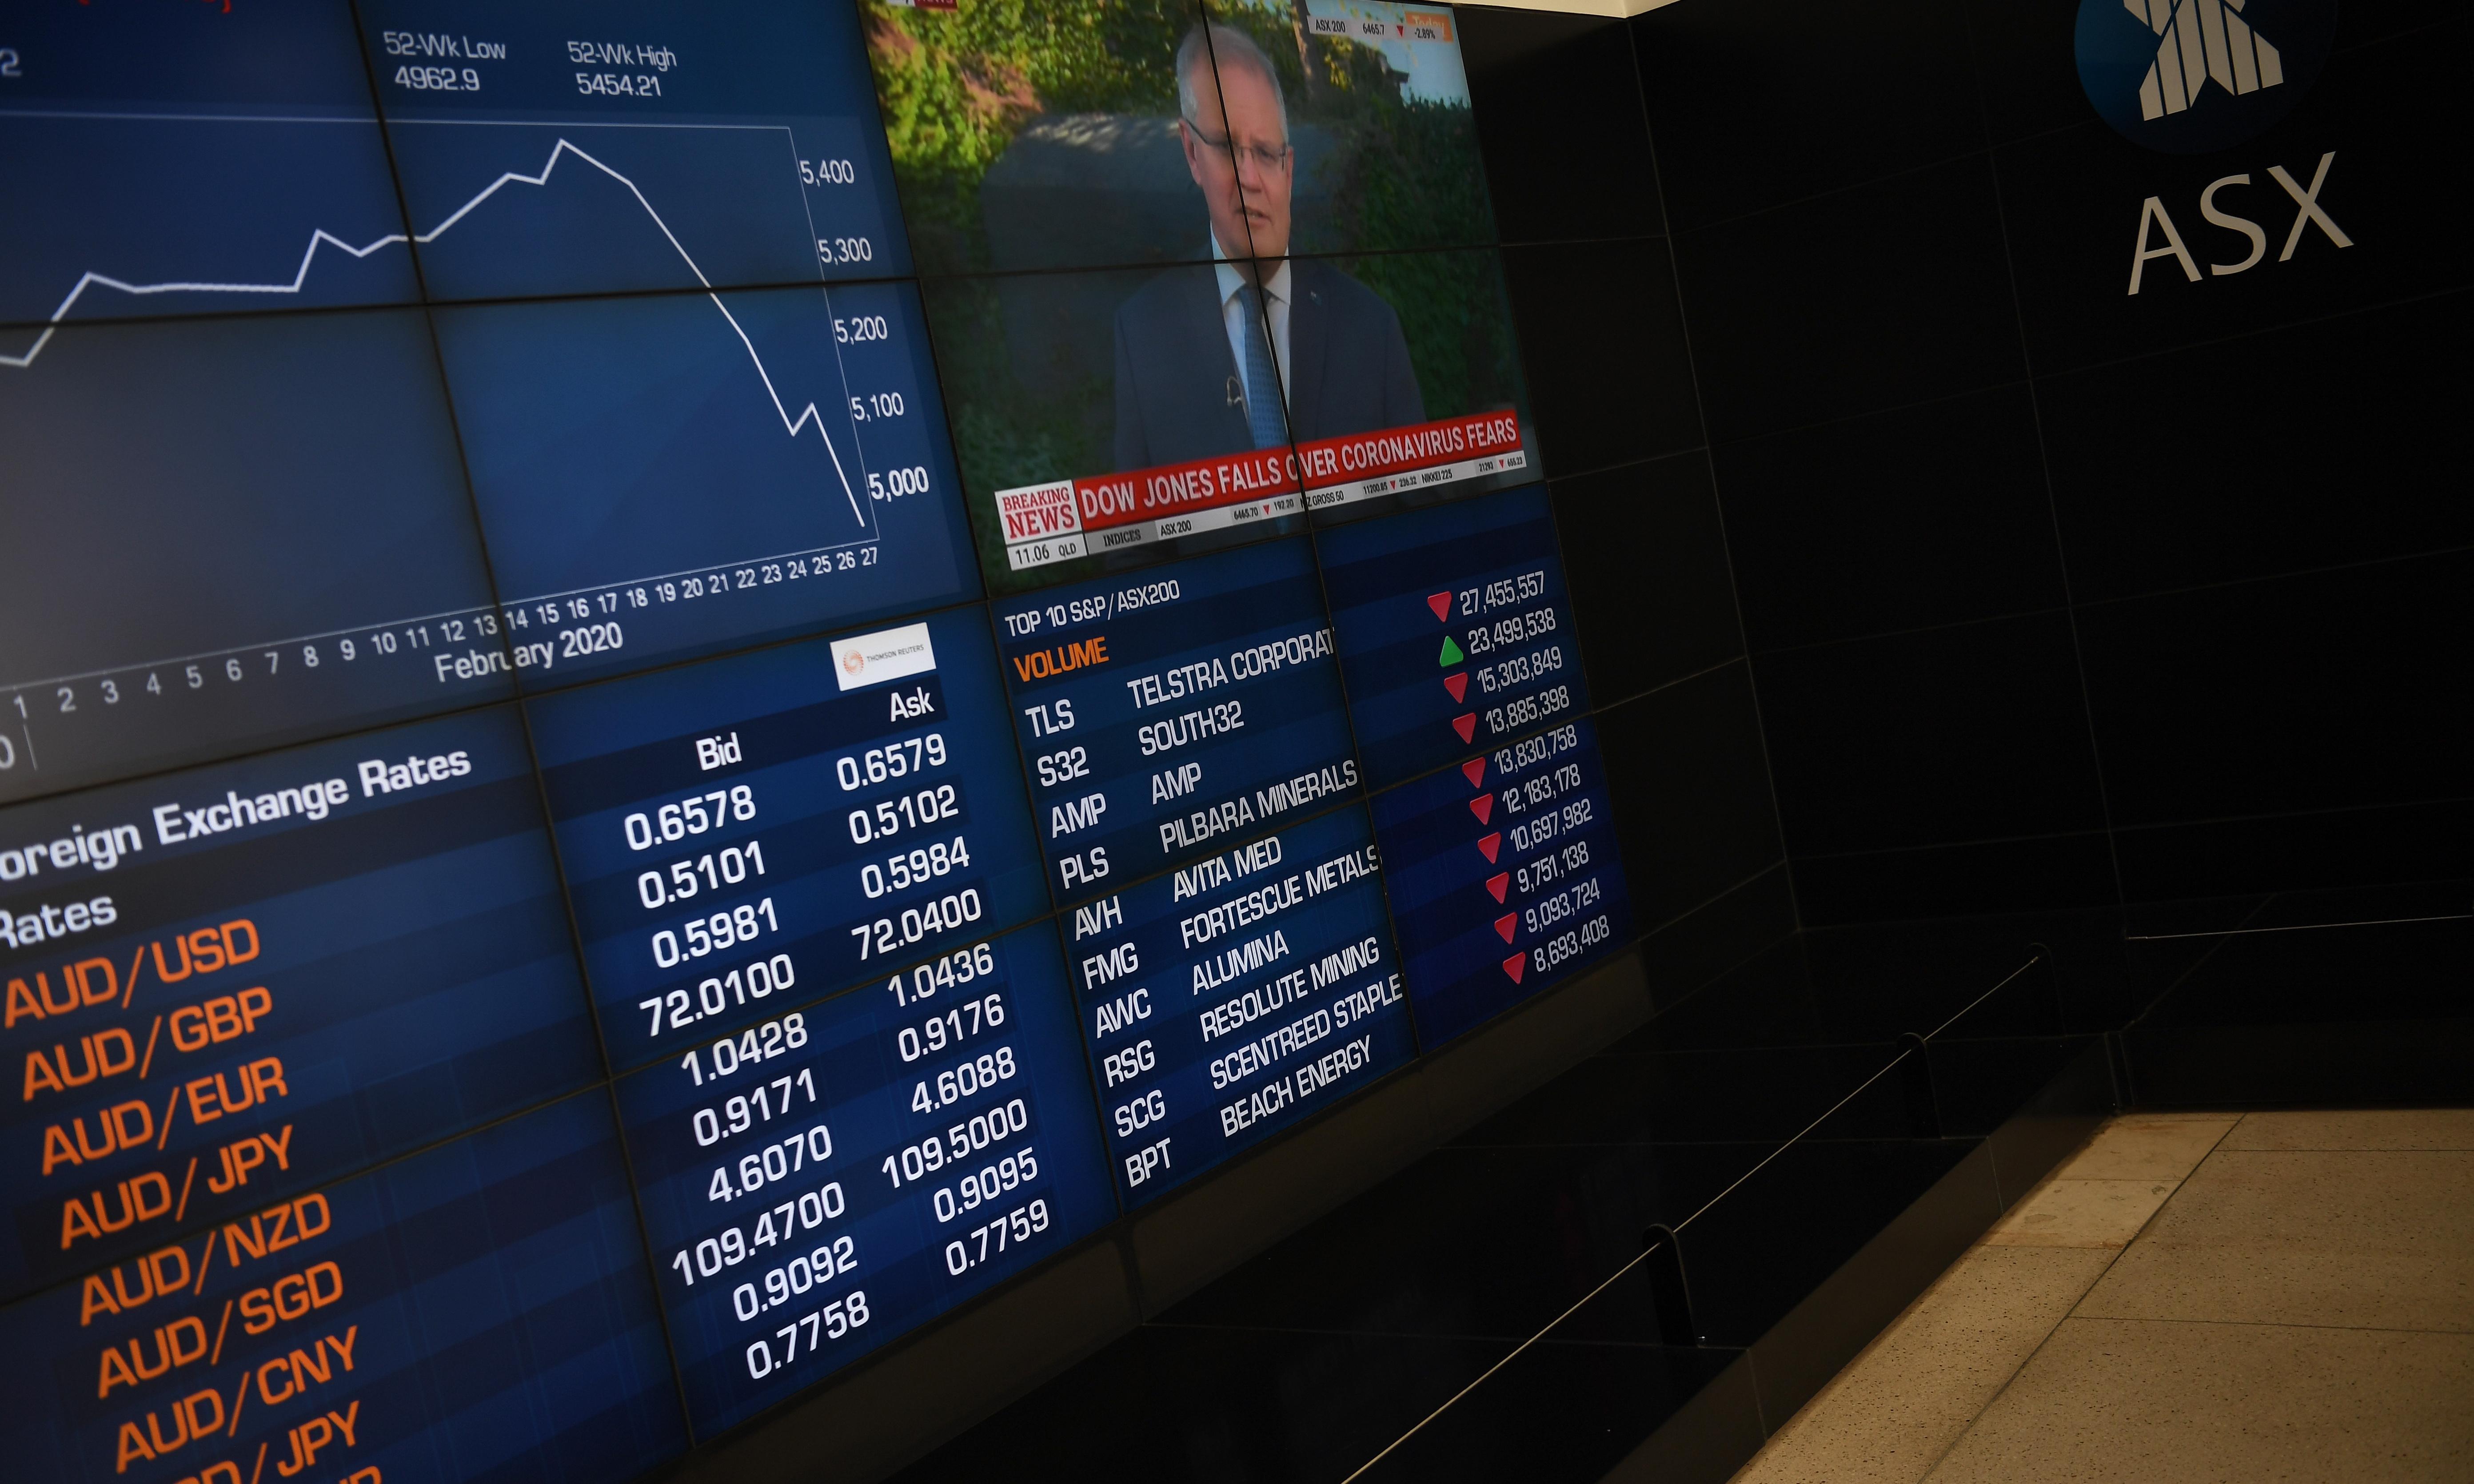 Australian stocks remain in freefall as coronavirus panic drives market down 10% for week